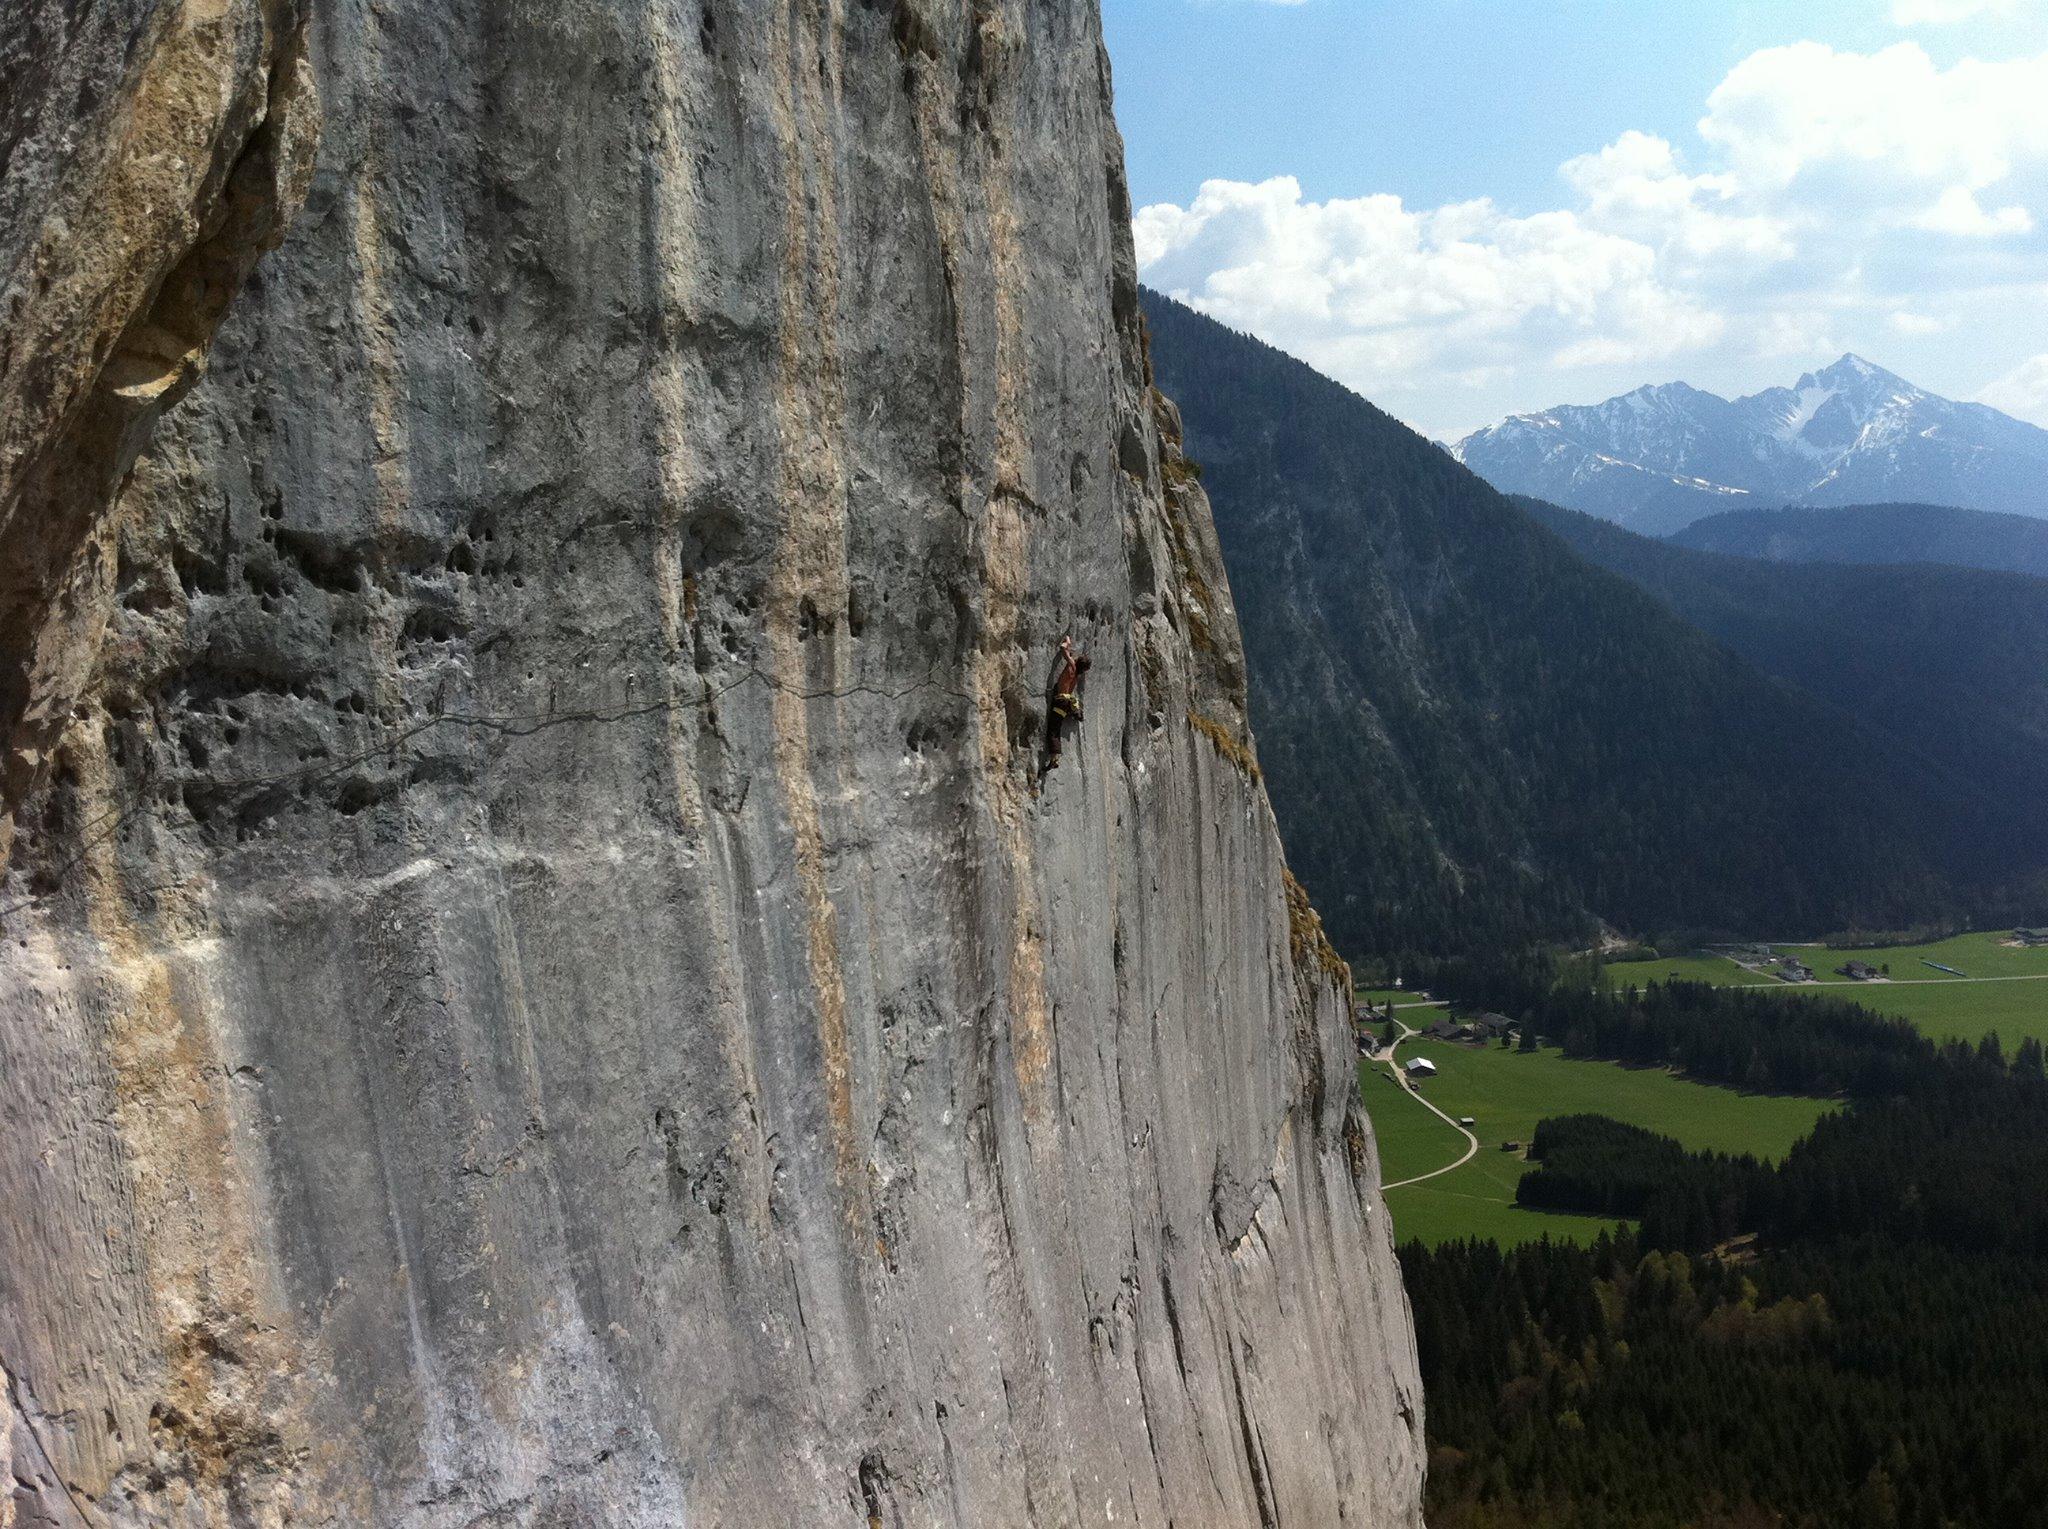 Klettergarten Chinesische Mauer, Wilde Mändle (7a) im Sektor Hongkong